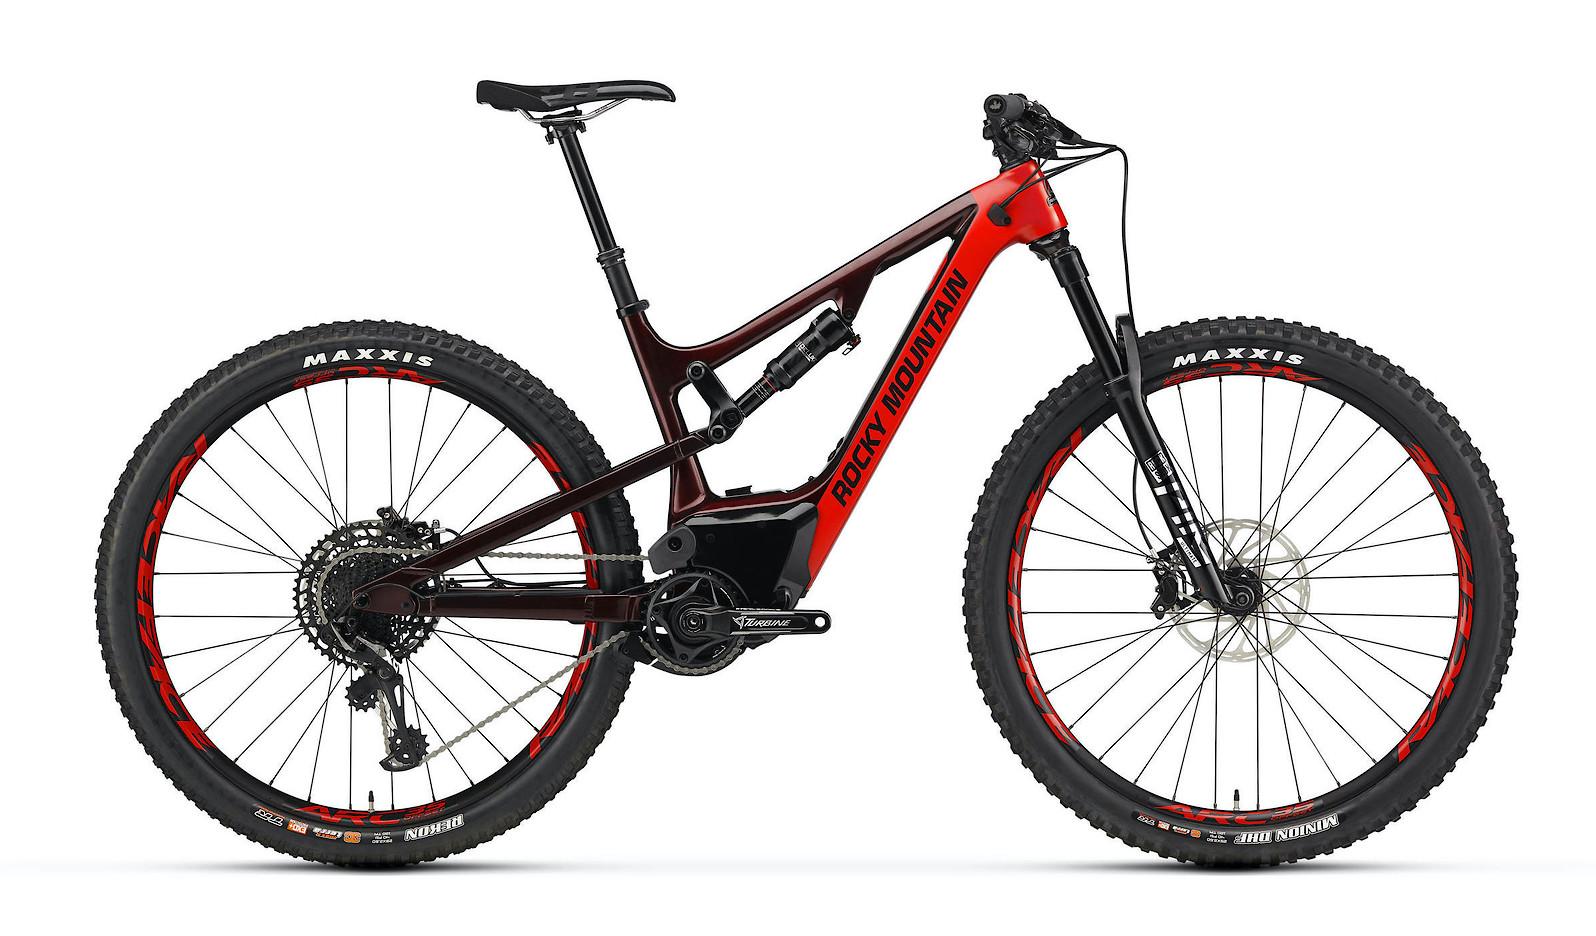 2020 Rocky Mountain Instinct Powerplay Carbon 90 (red)